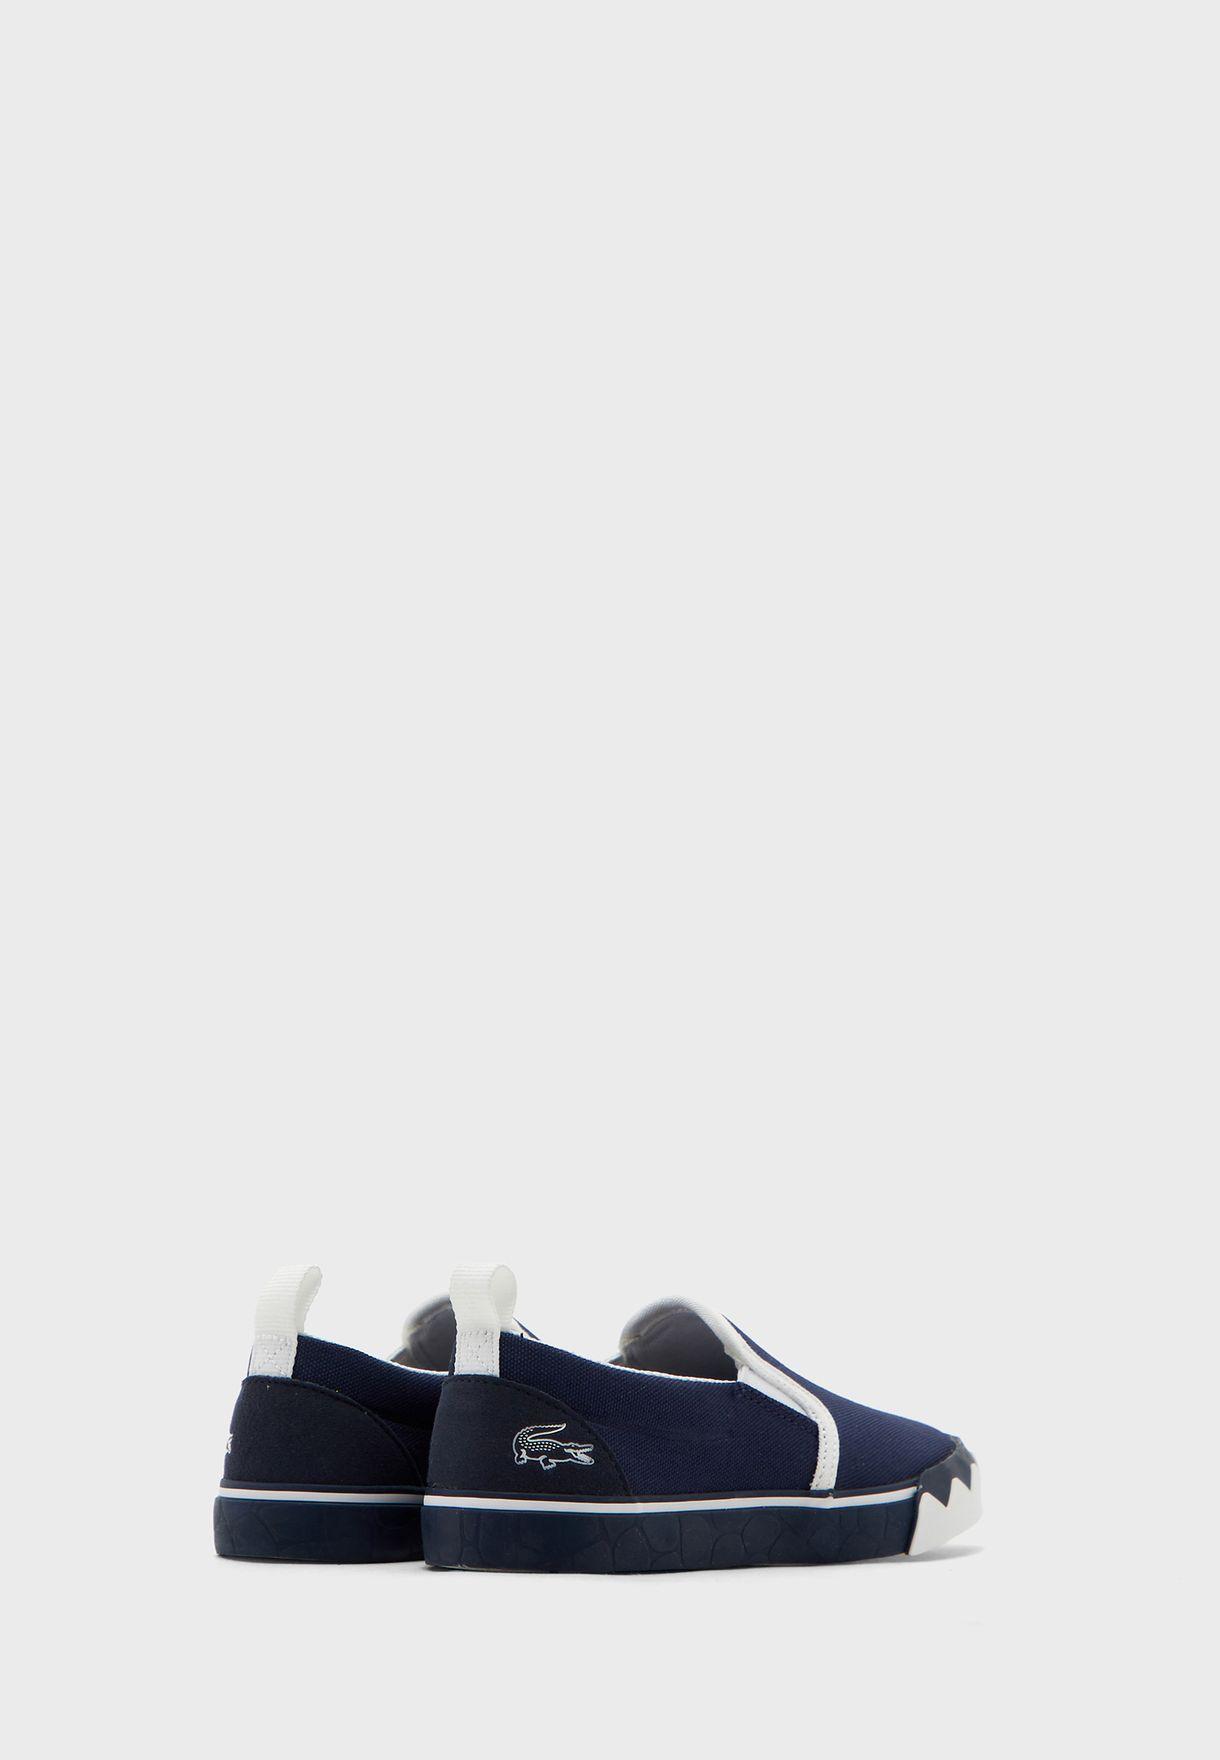 Youth Gazon Croco 220 1 Cuc Sneaker